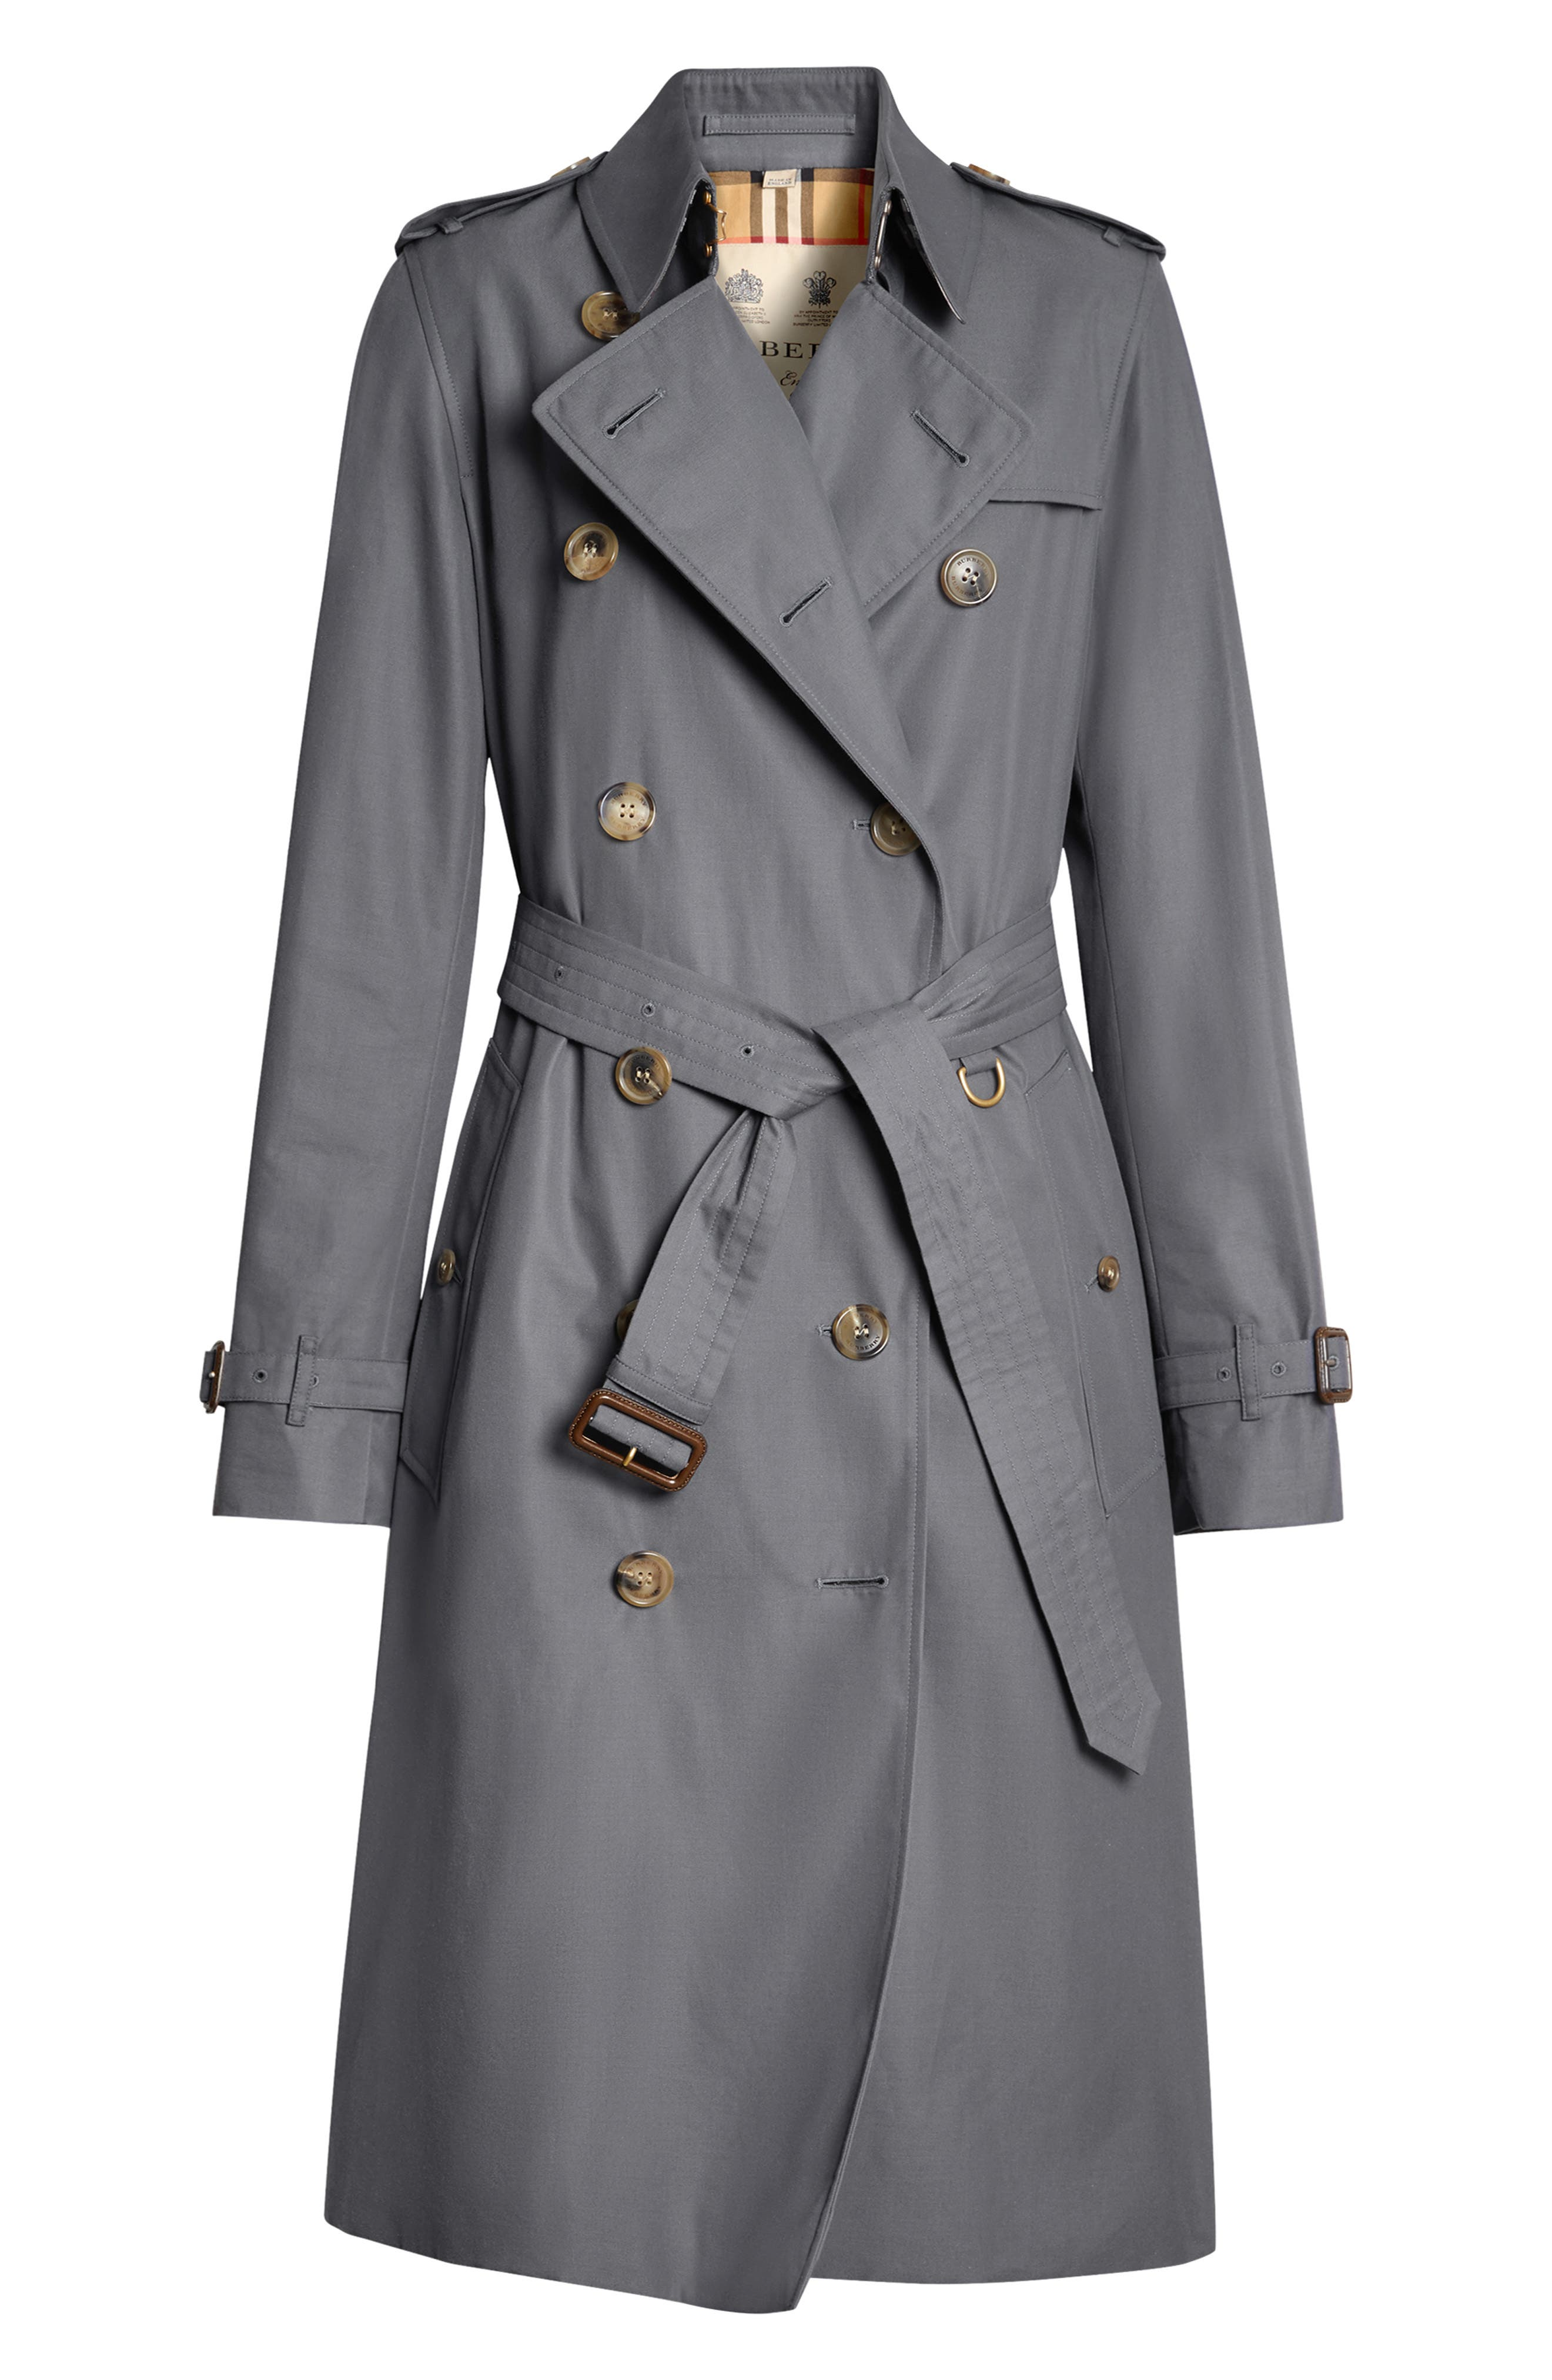 BURBERRY, Kensington Long Heritage Trench Coat, Alternate thumbnail 4, color, MID GREY